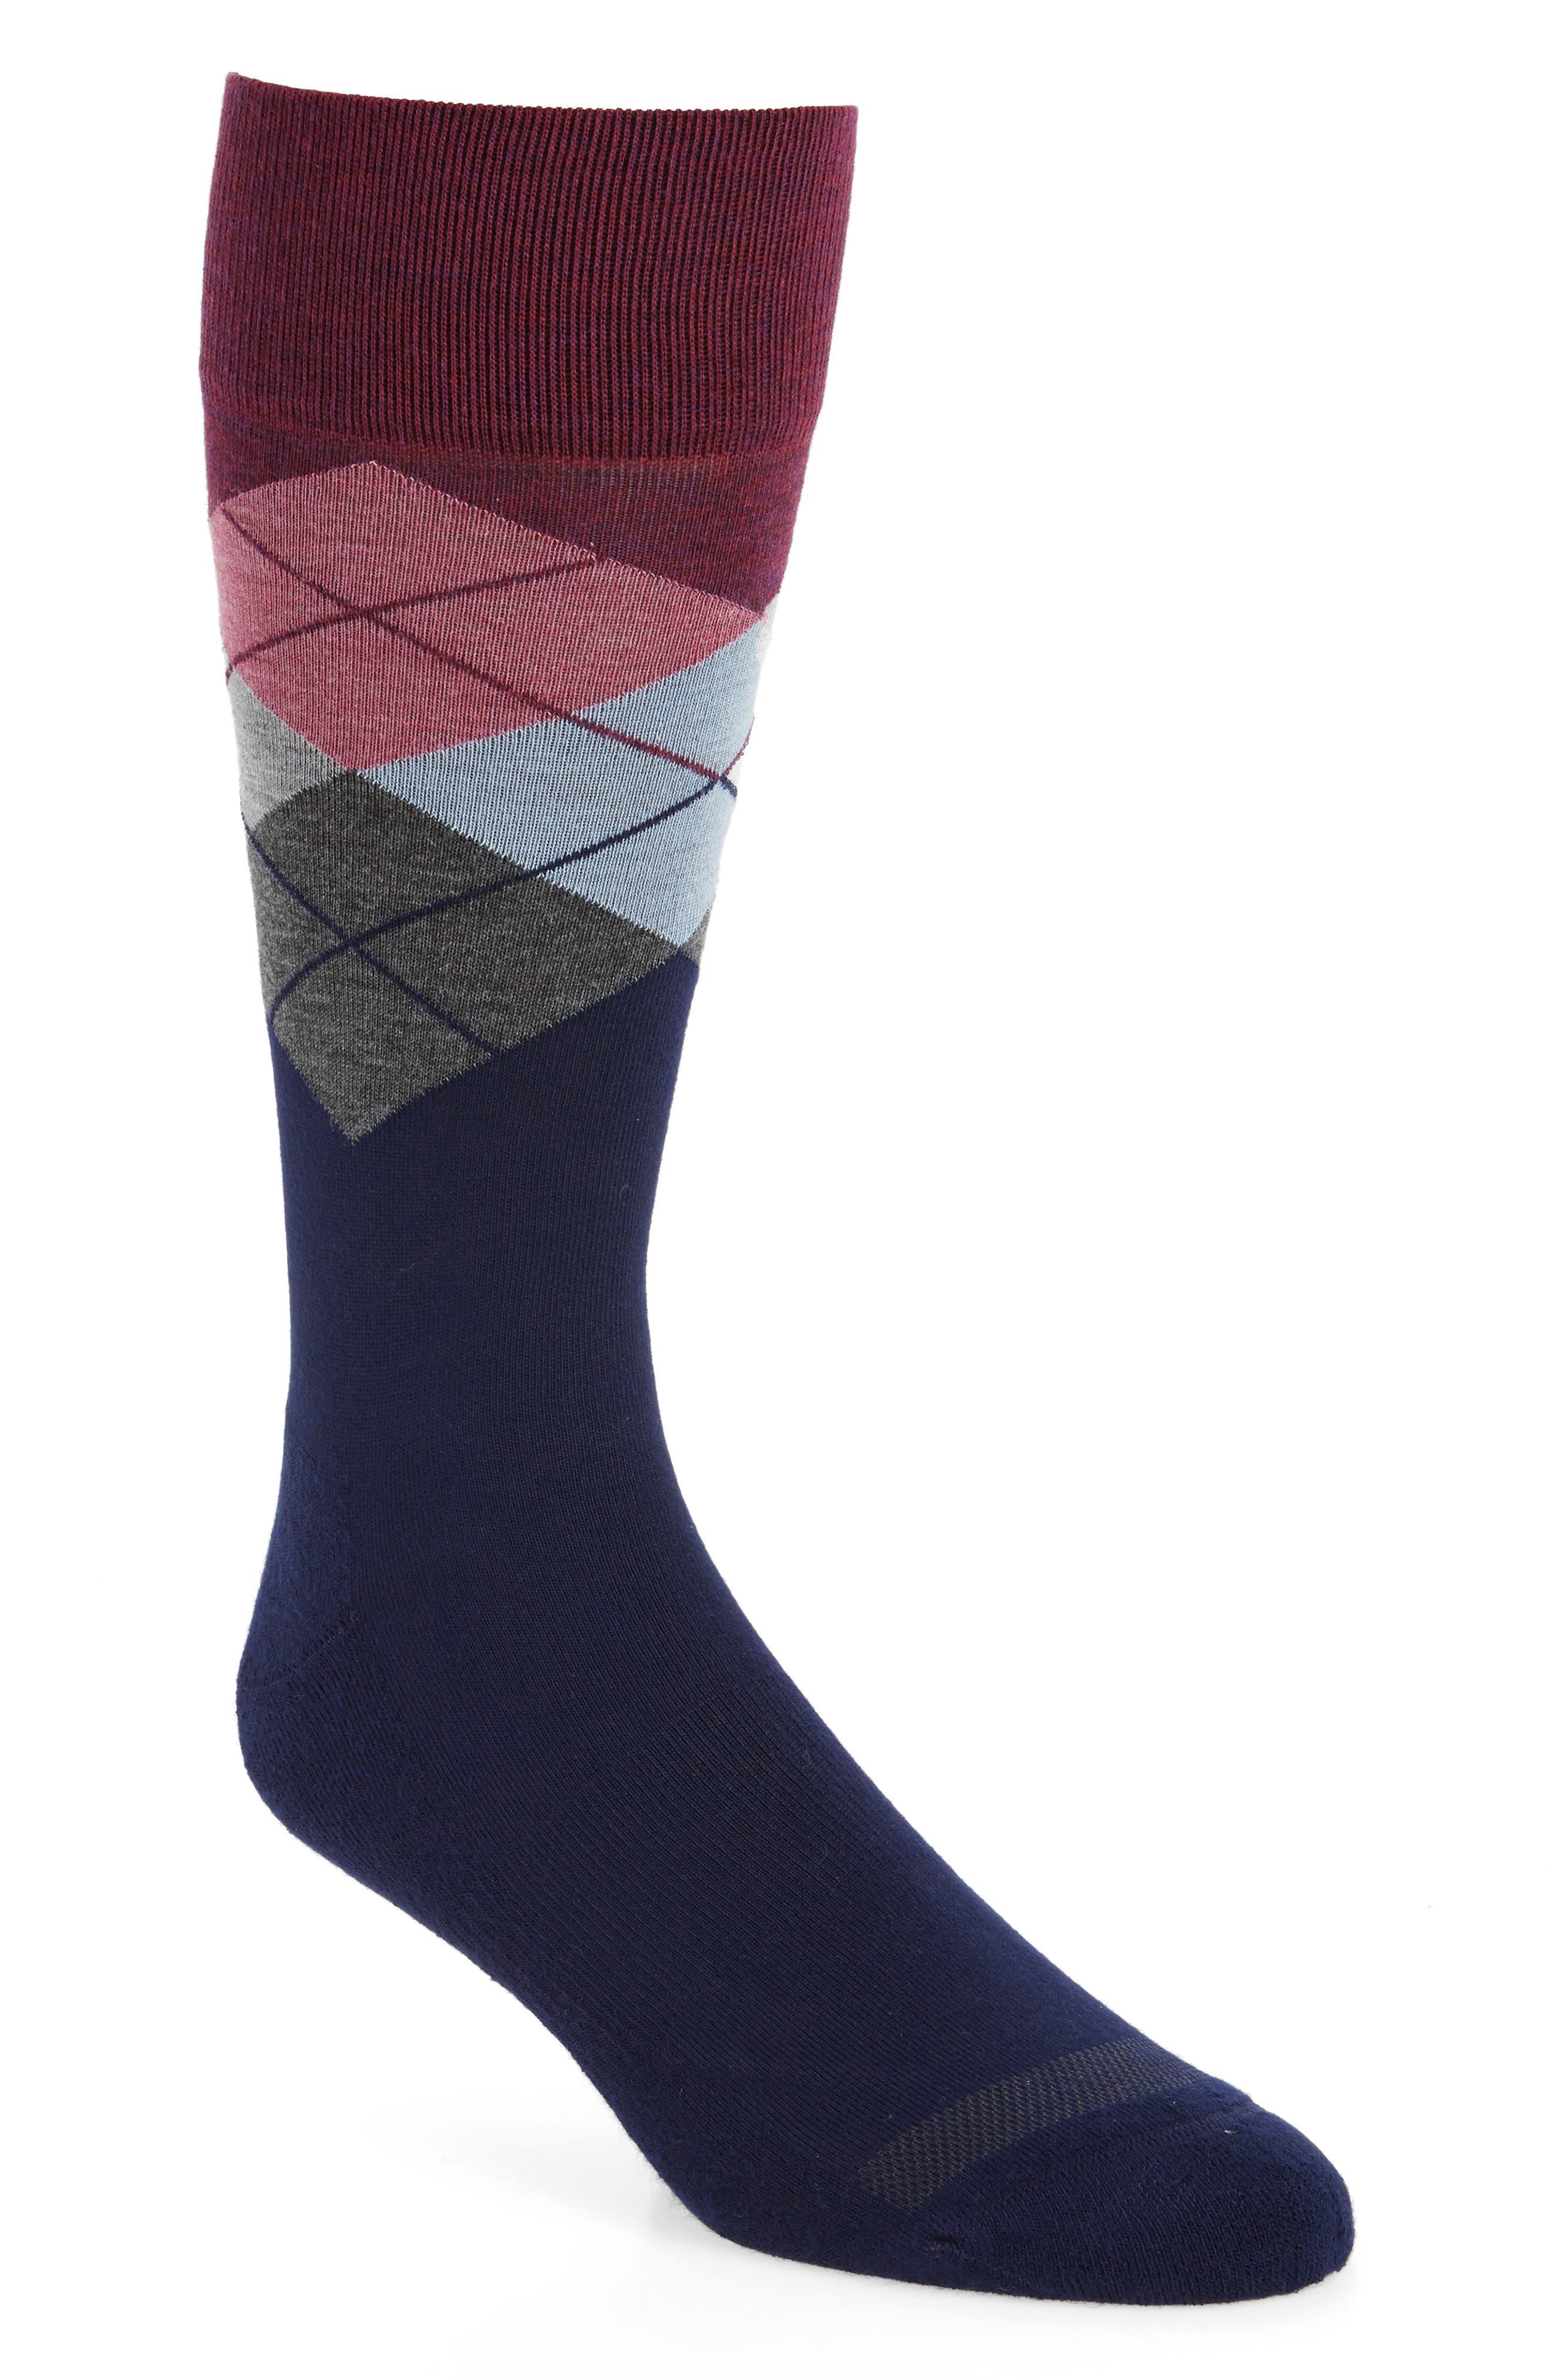 Argyle Socks,                             Main thumbnail 1, color,                             Burgundy